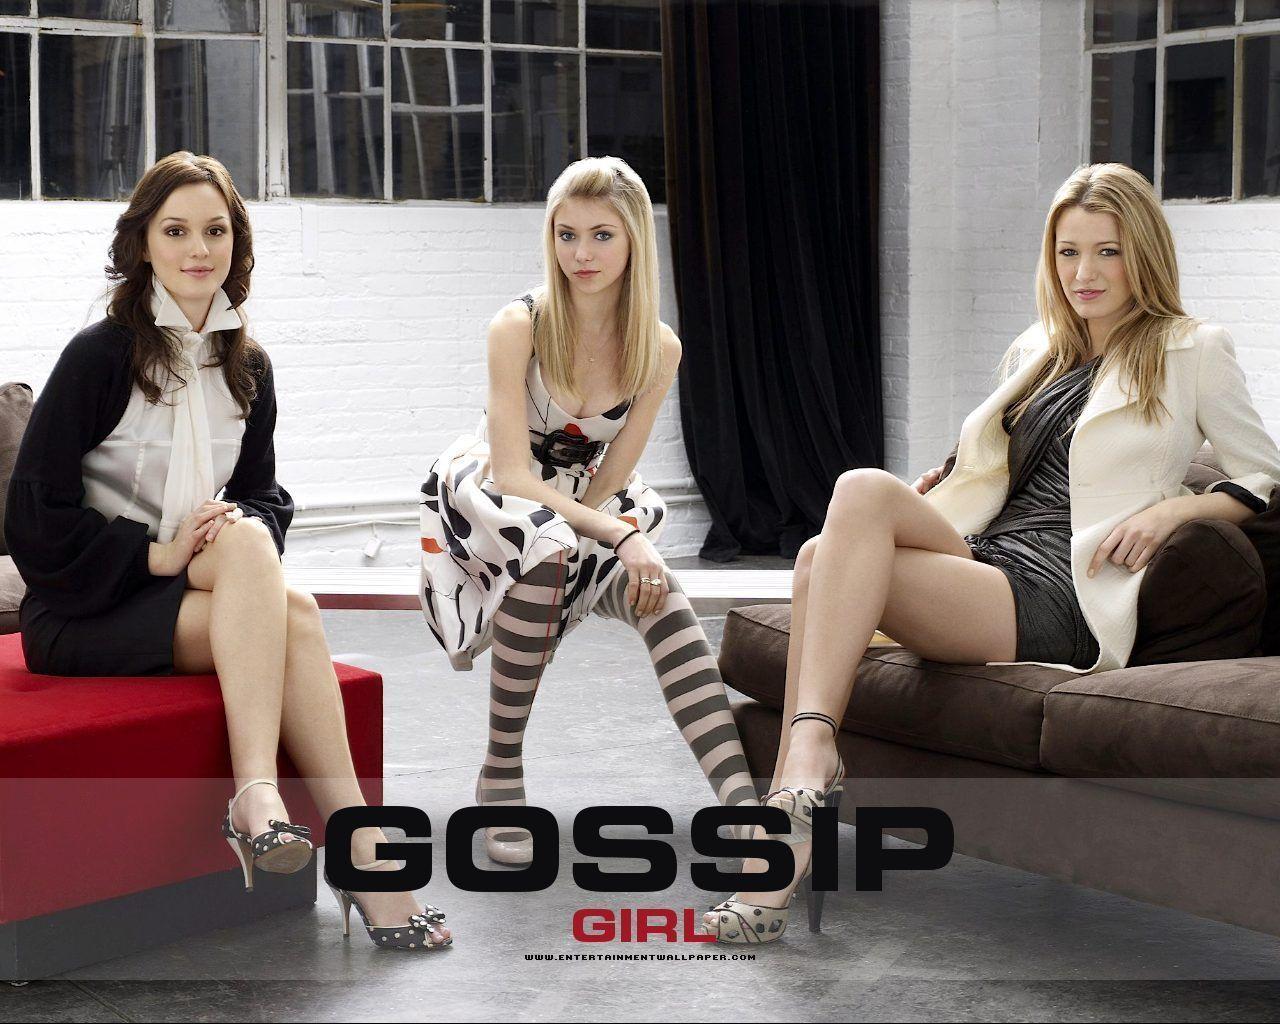 http://2.bp.blogspot.com/-5j7J34WNQ5U/Ti4iQbqgG1I/AAAAAAAAAis/YvGPTan4a0U/s1600/Gossip-Girl-Cast-gossip-girl-8062239-1280-1024.jpg